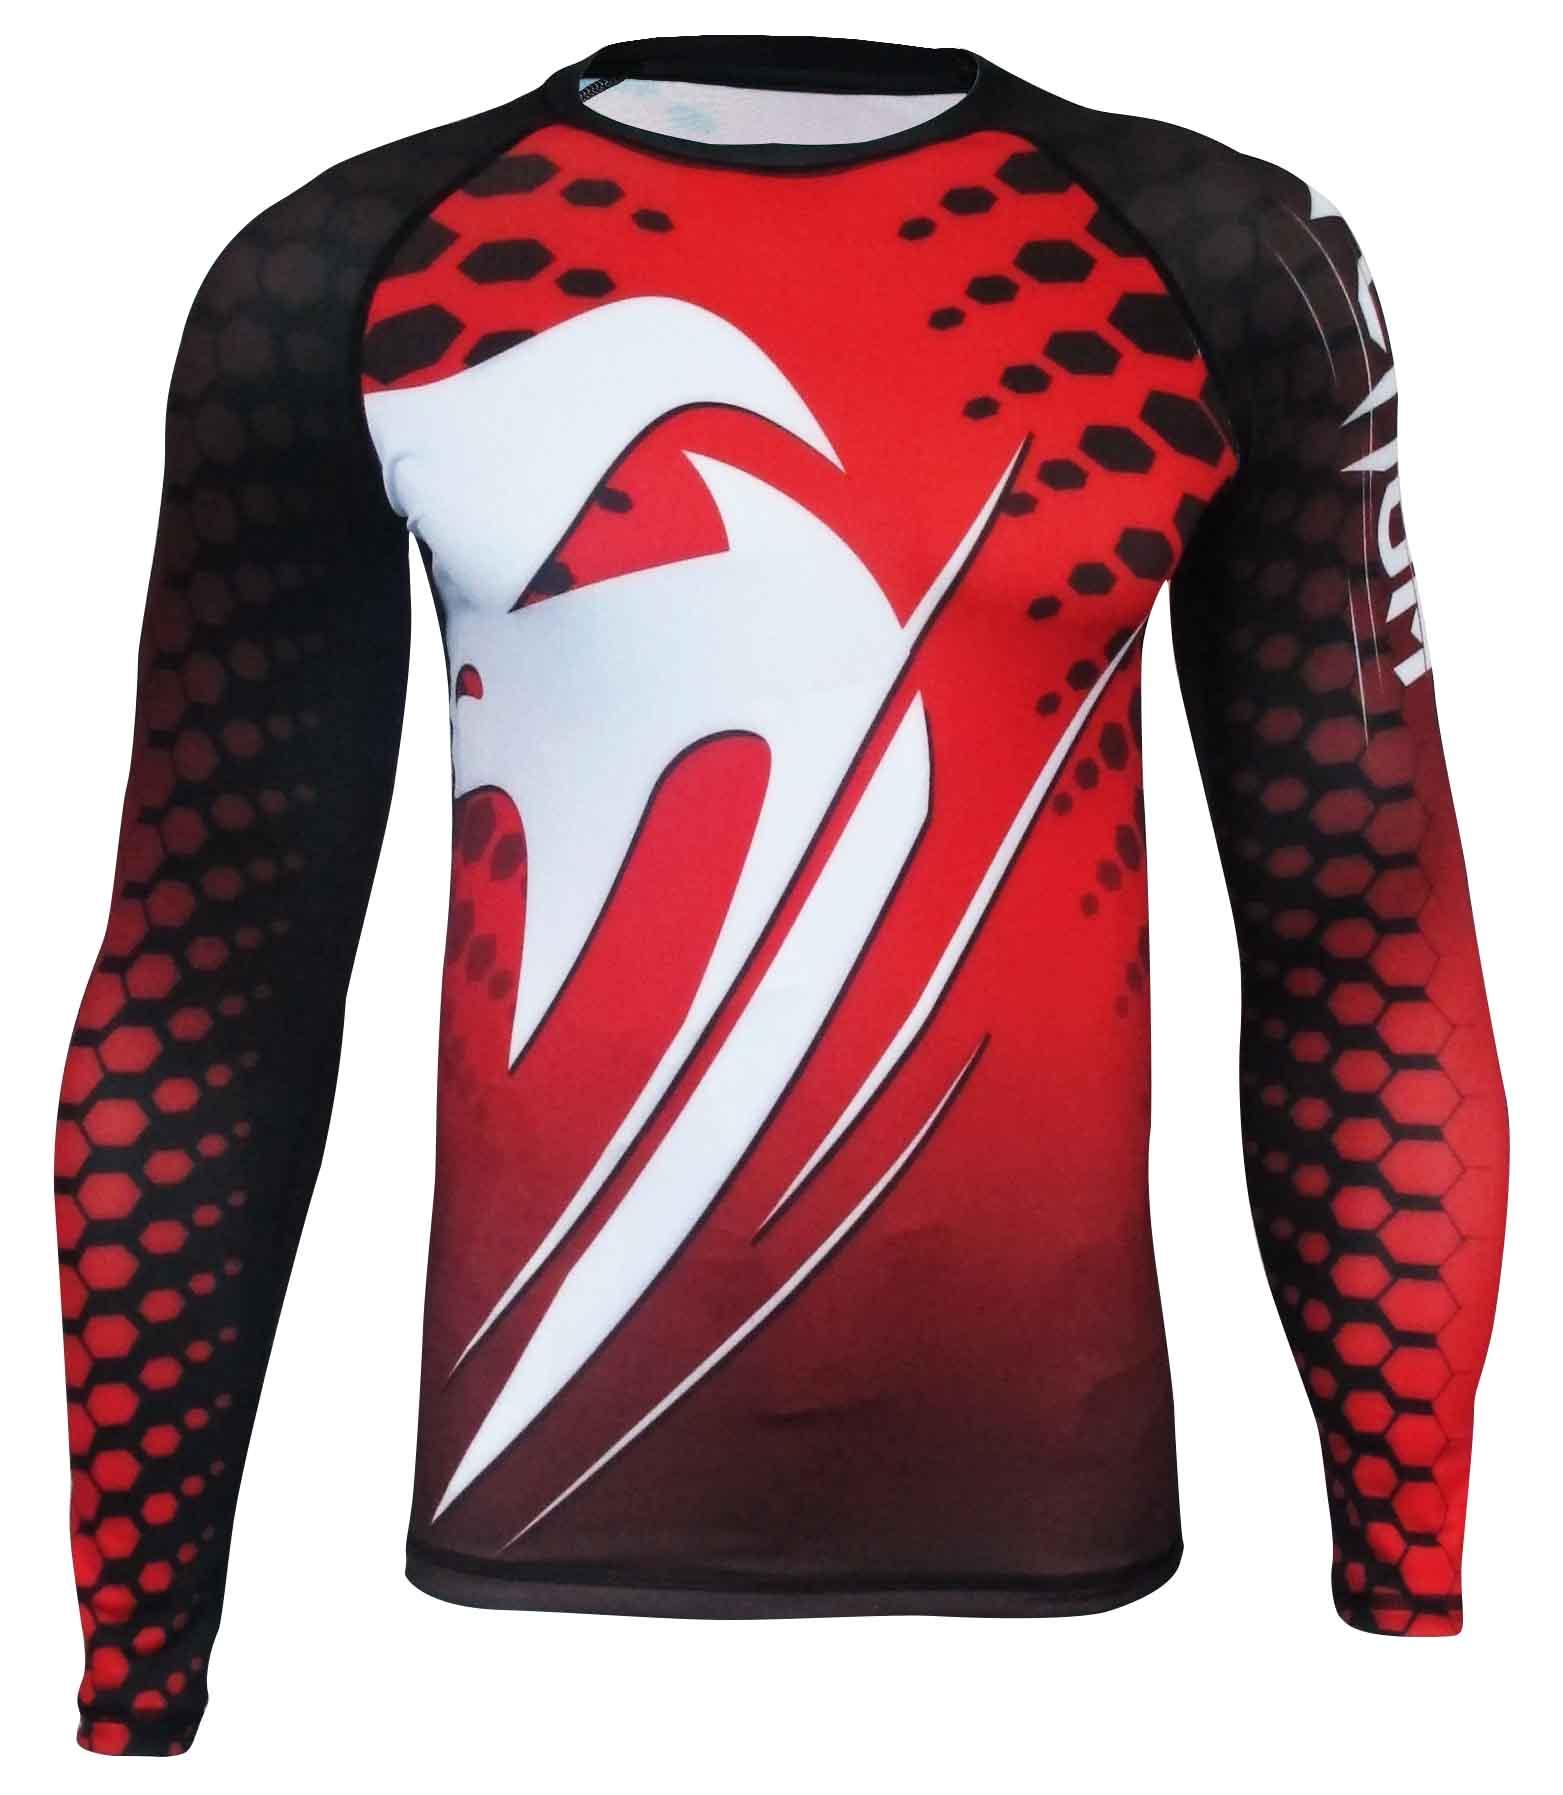 Camisa Rash Guard/ Lycra-  Amazônia Brasil - Manga Longa - Vermelho - Venum  - Loja do Competidor